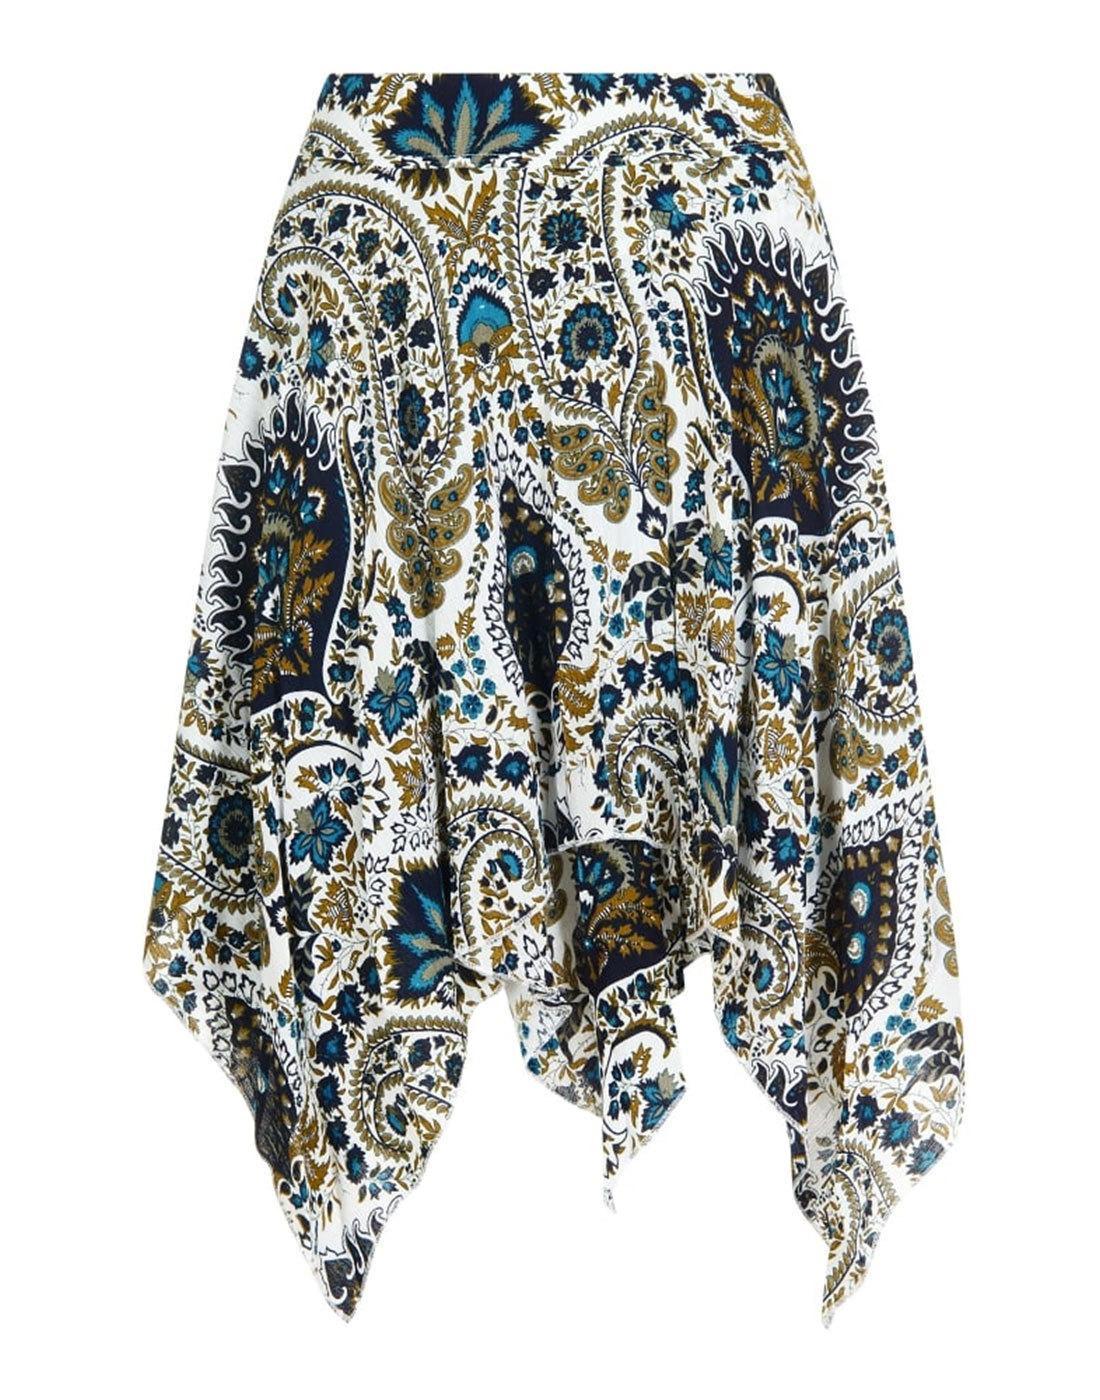 Anna BRIGHT & BEAUTIFUL Retro Boho 70s Skirt